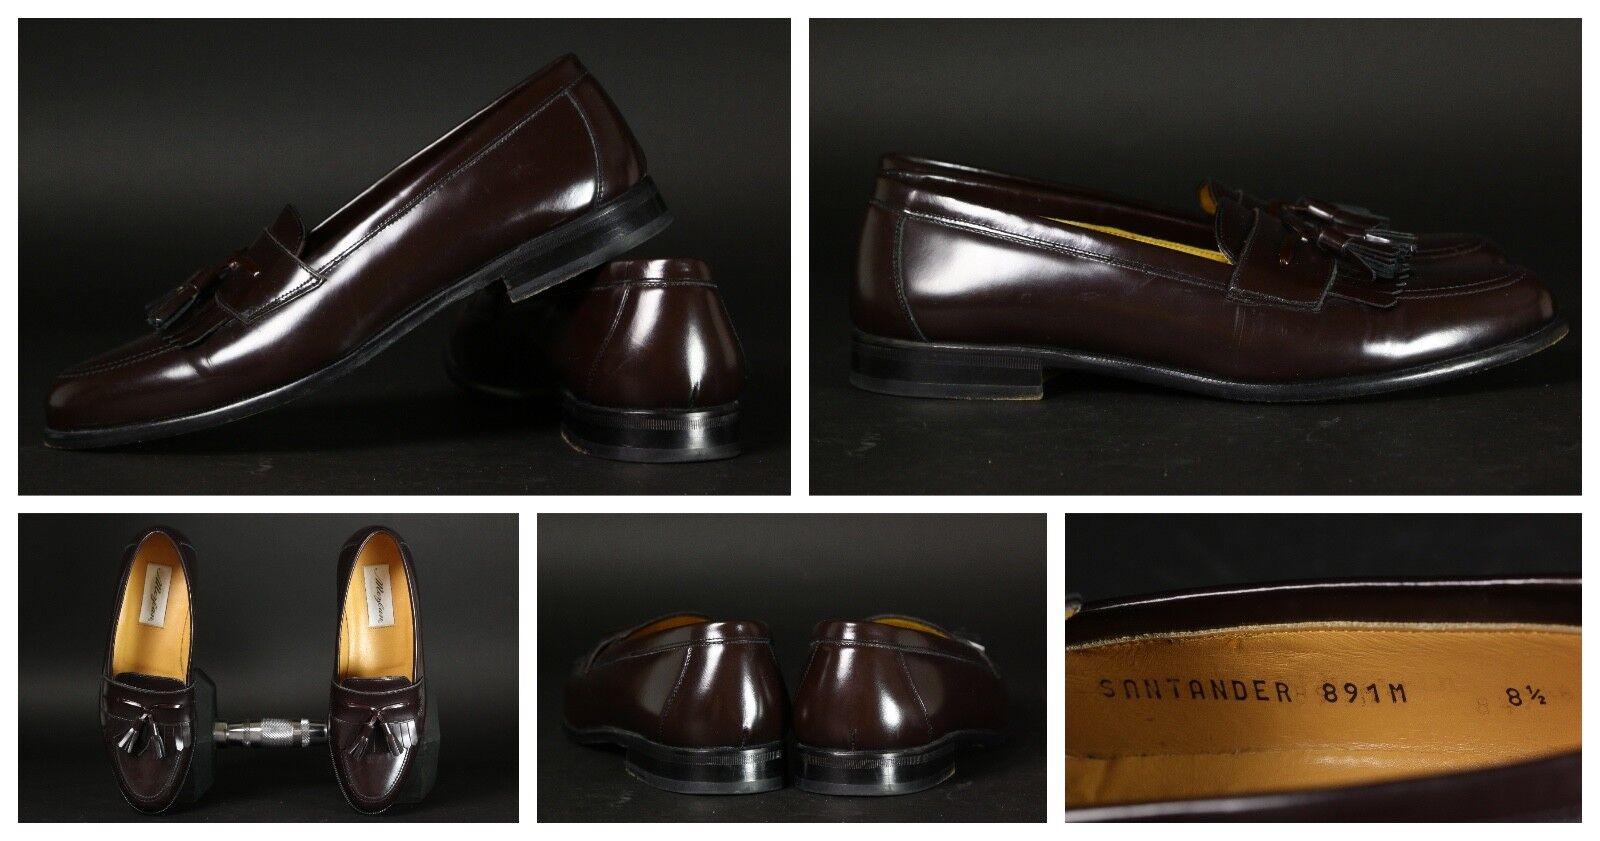 MEZLAN Santander Men's Burgundy Leather Kiltie Tassel Loafers Size 8 1 2 M Spain